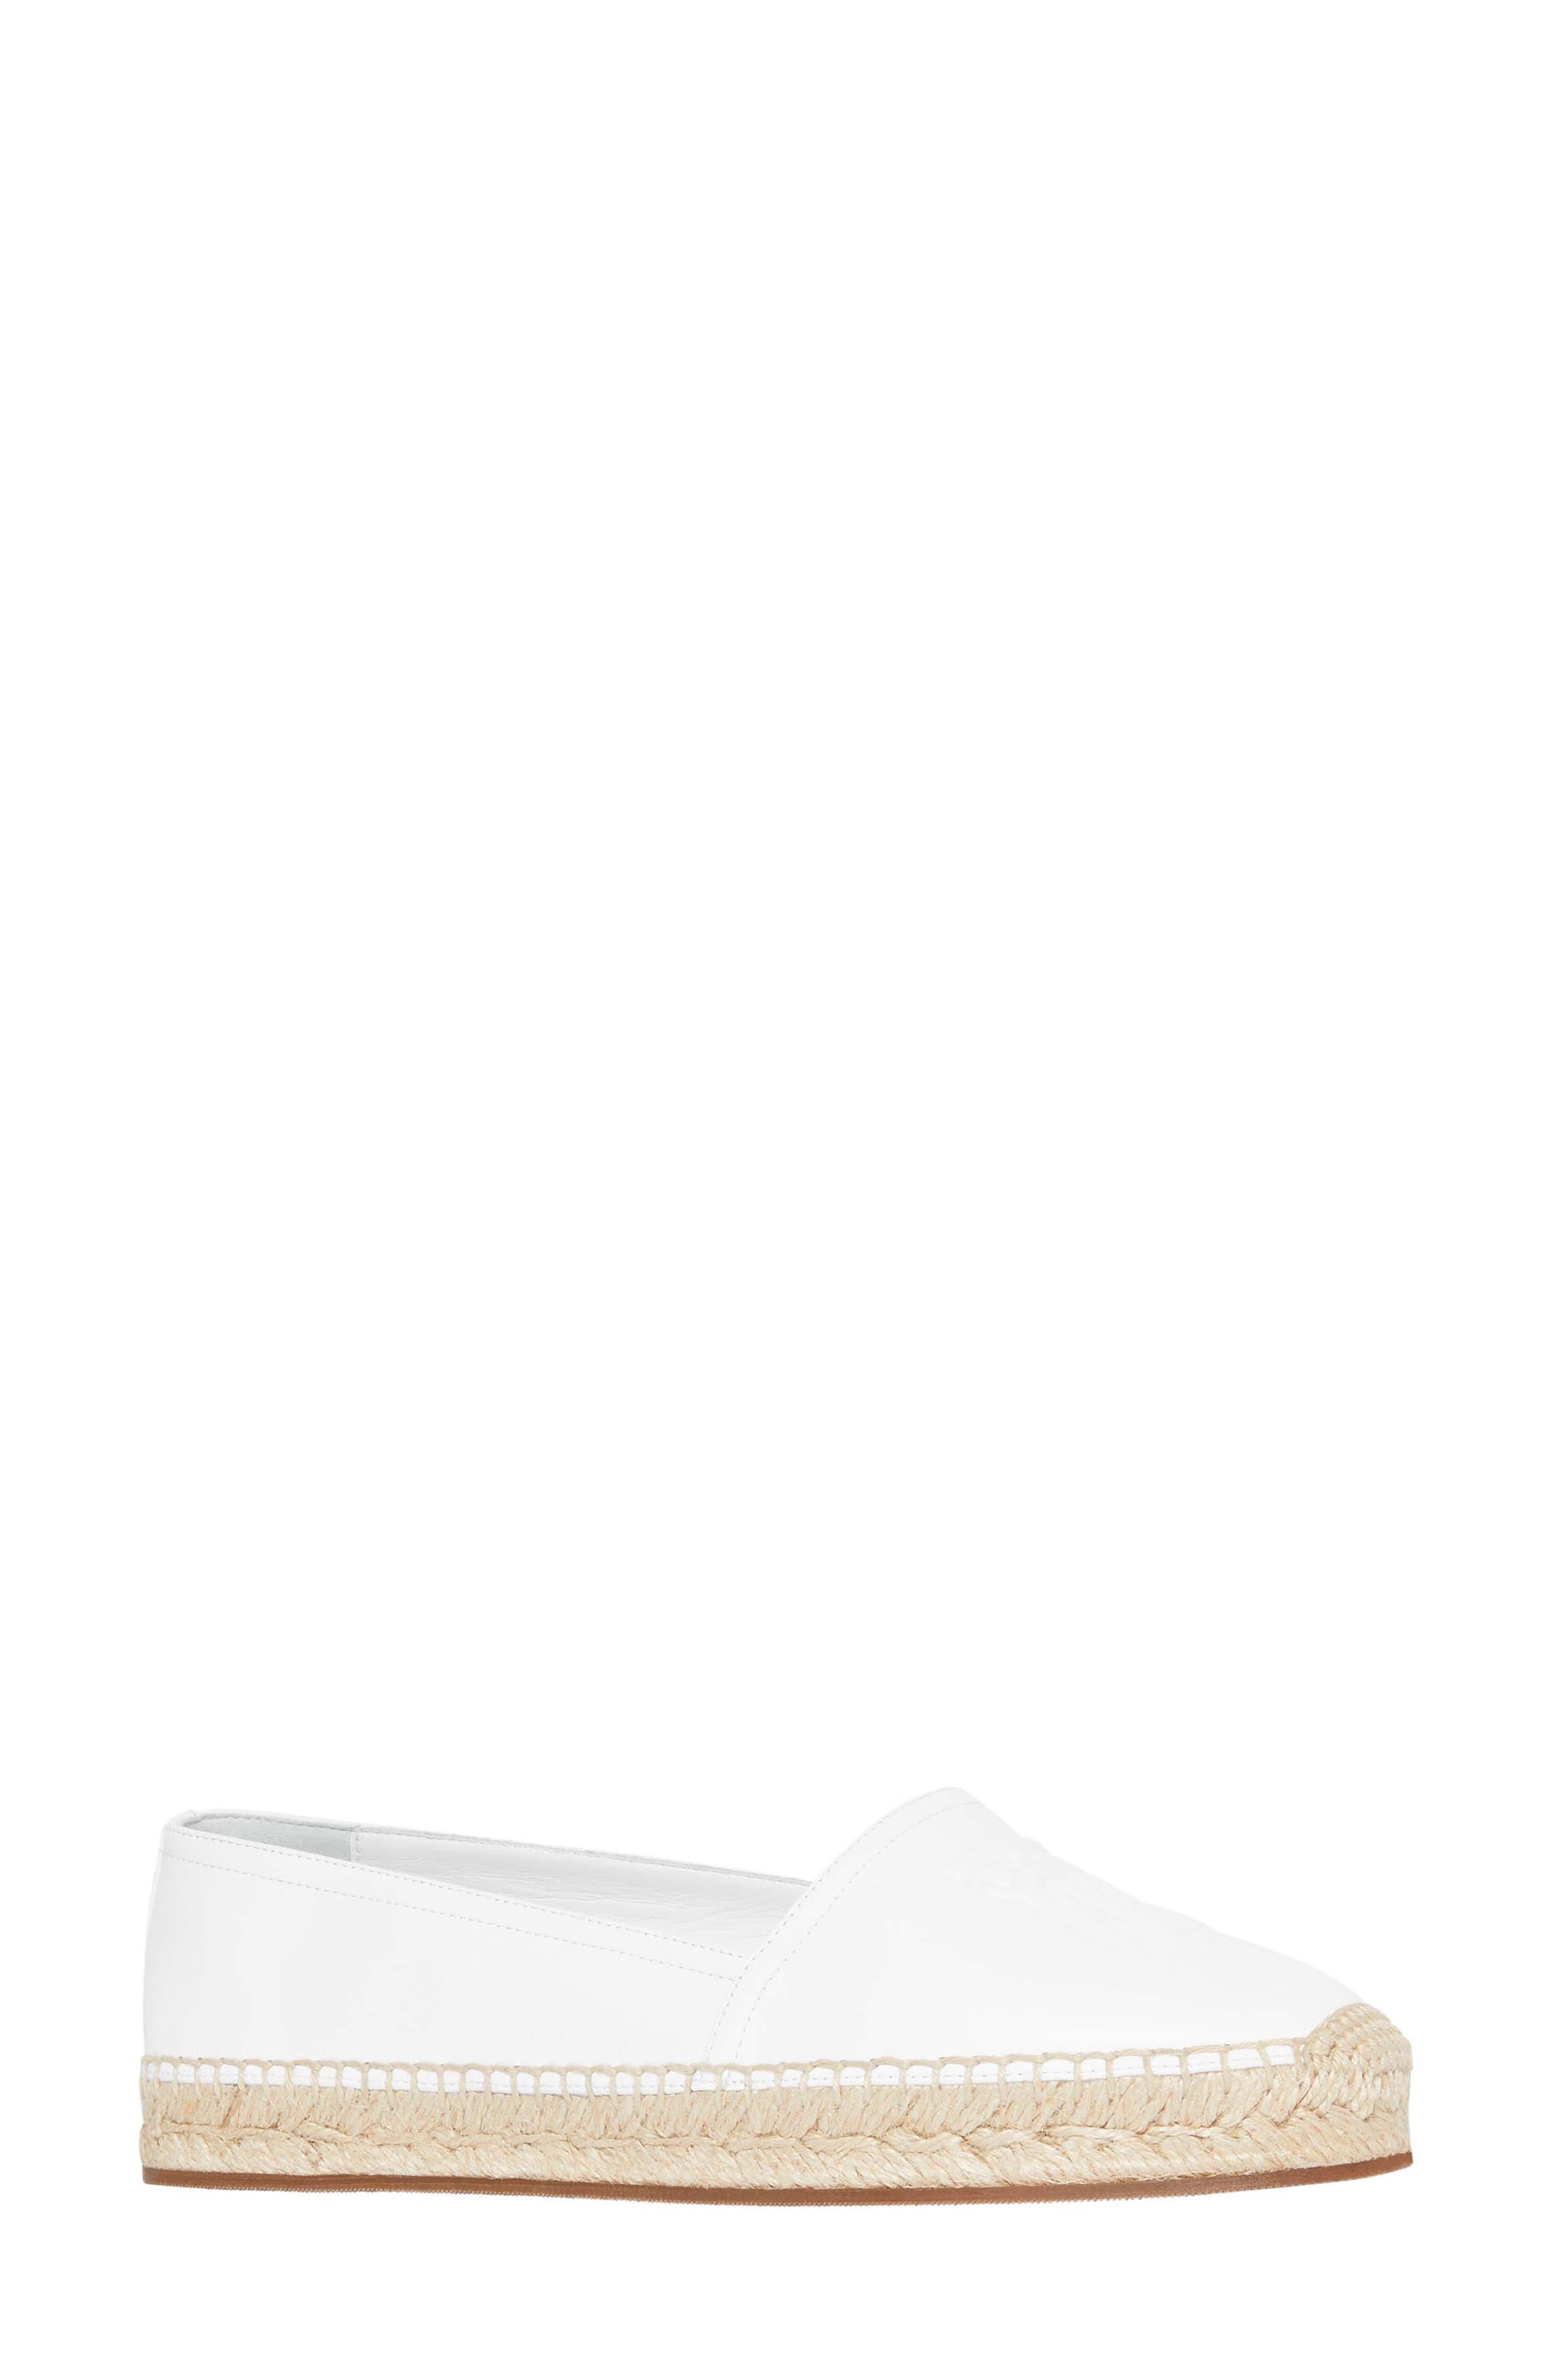 Burberry Tabitha Logo Monogram Espadrille Flat, White